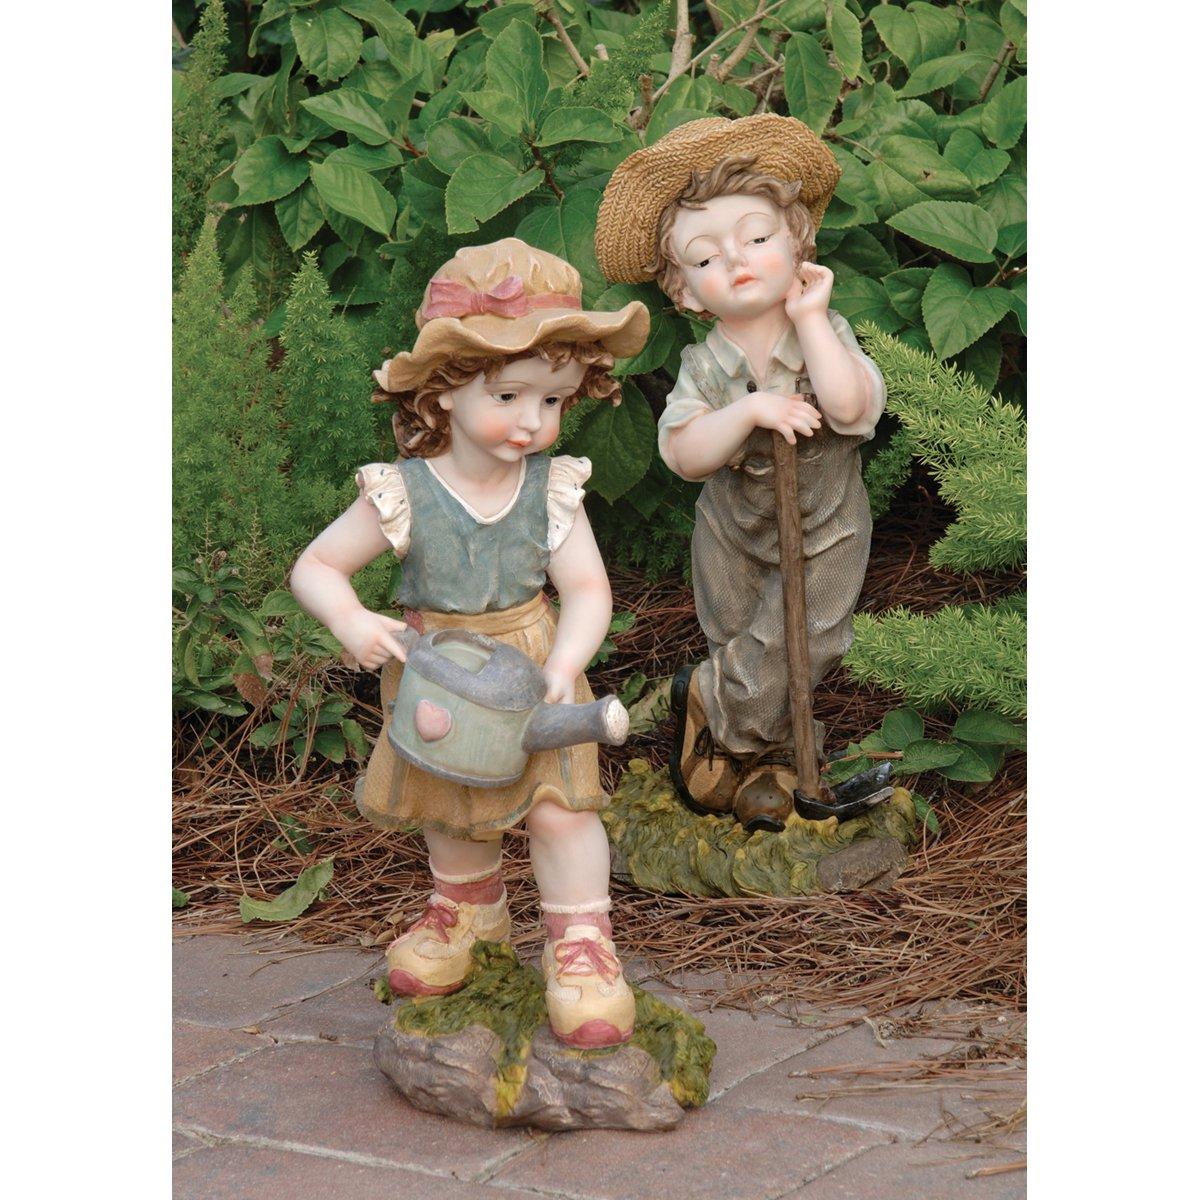 Children Garden Statues. Children Garden Statues I